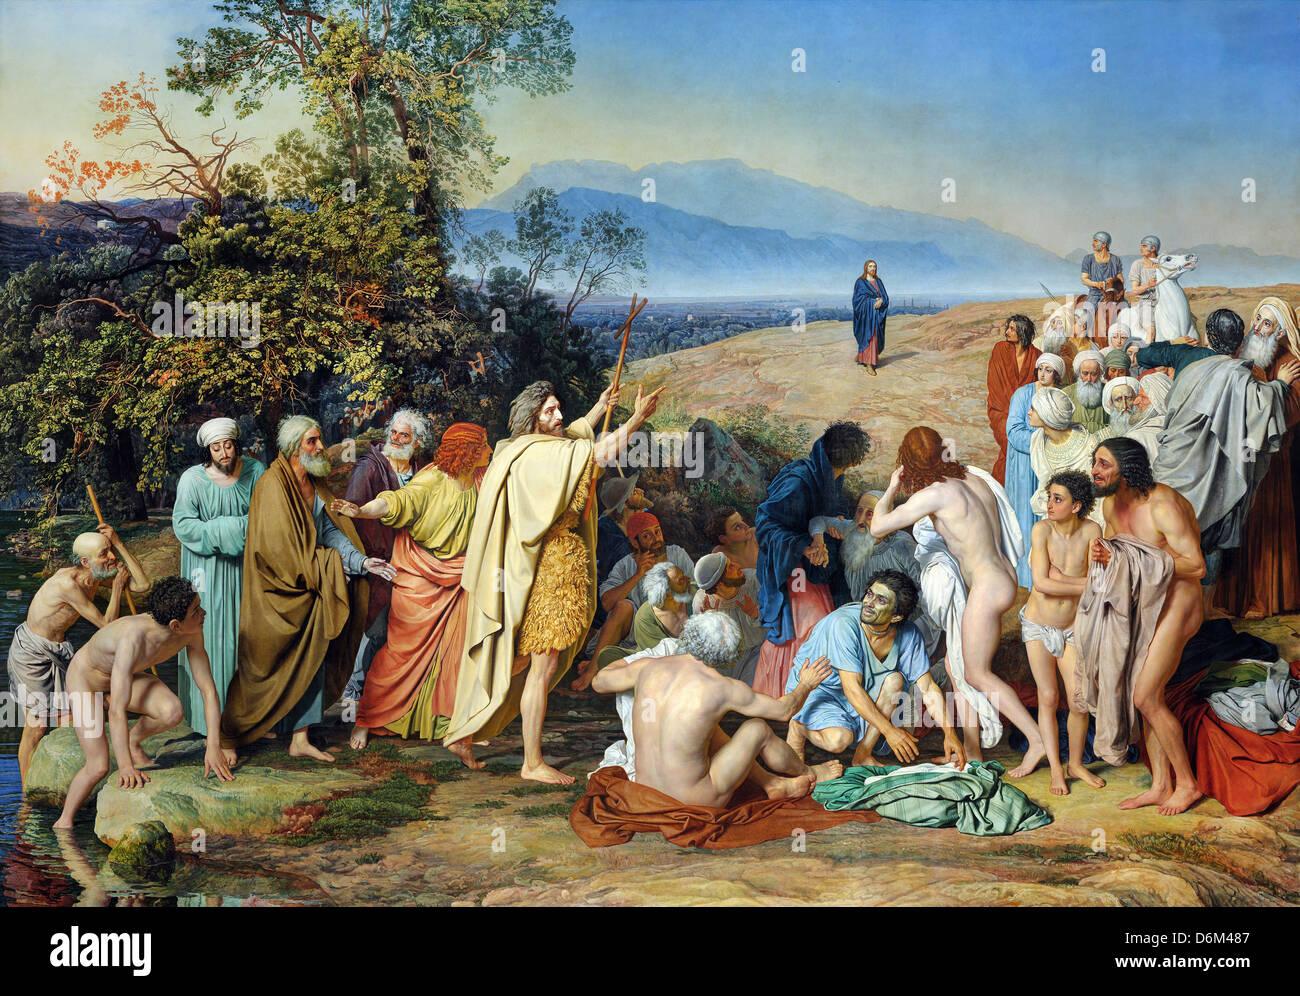 Alexey Venetsianov, apparition du Christ au peuple 1837-1857 Huile sur toile. Galerie Tretiakov, Moscou, Russie Photo Stock